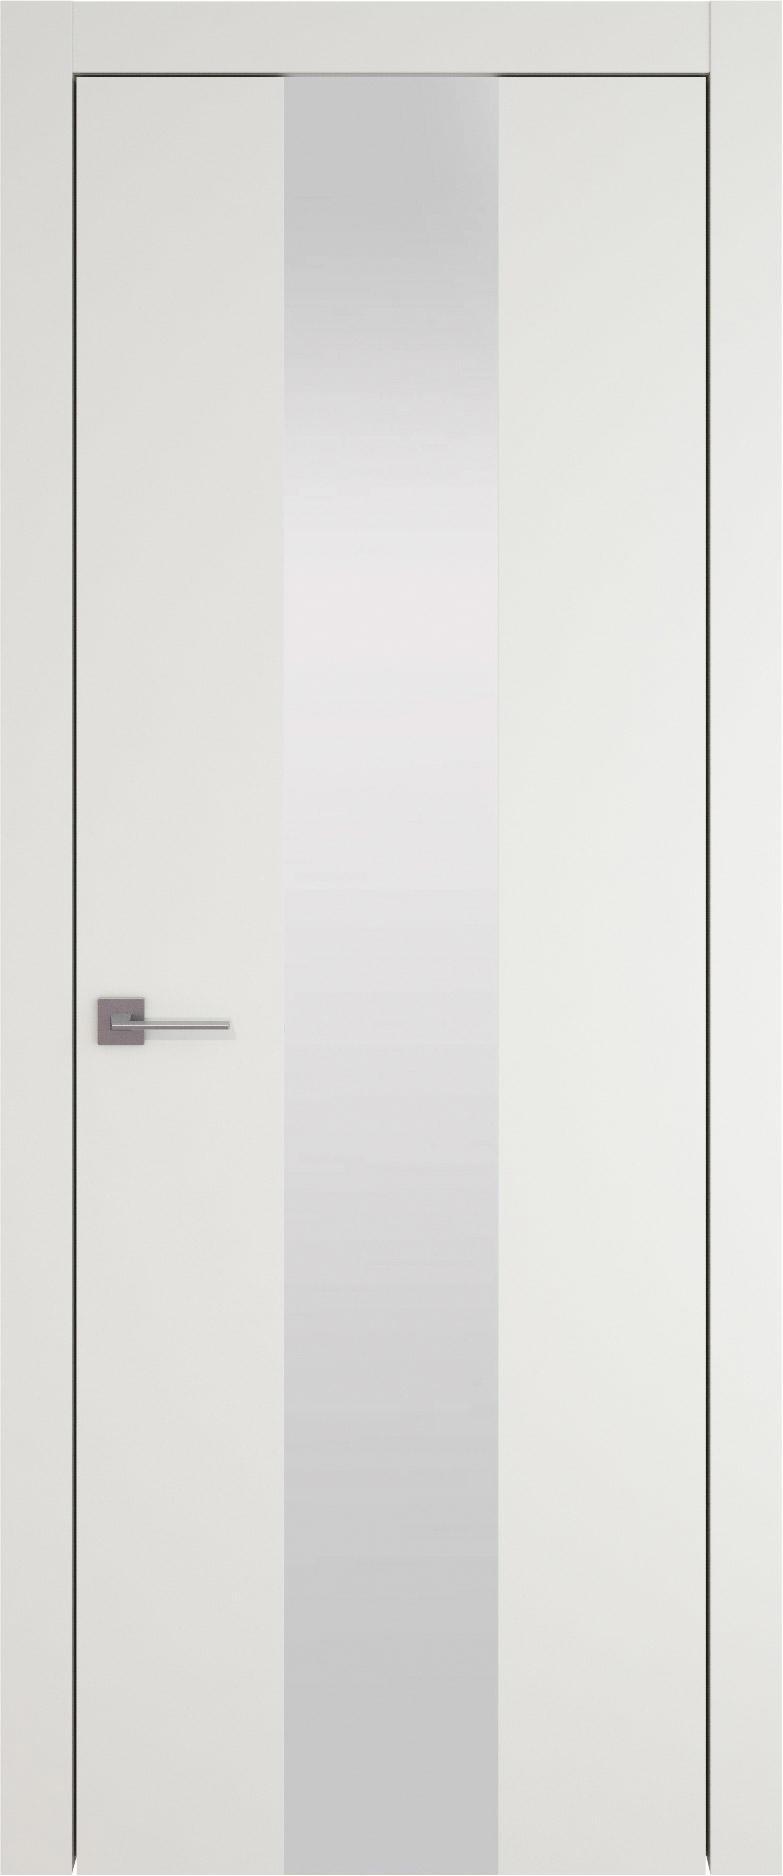 Tivoli Ж-1 цвет - Бежевая эмаль (RAL 9010) Со стеклом (ДО)